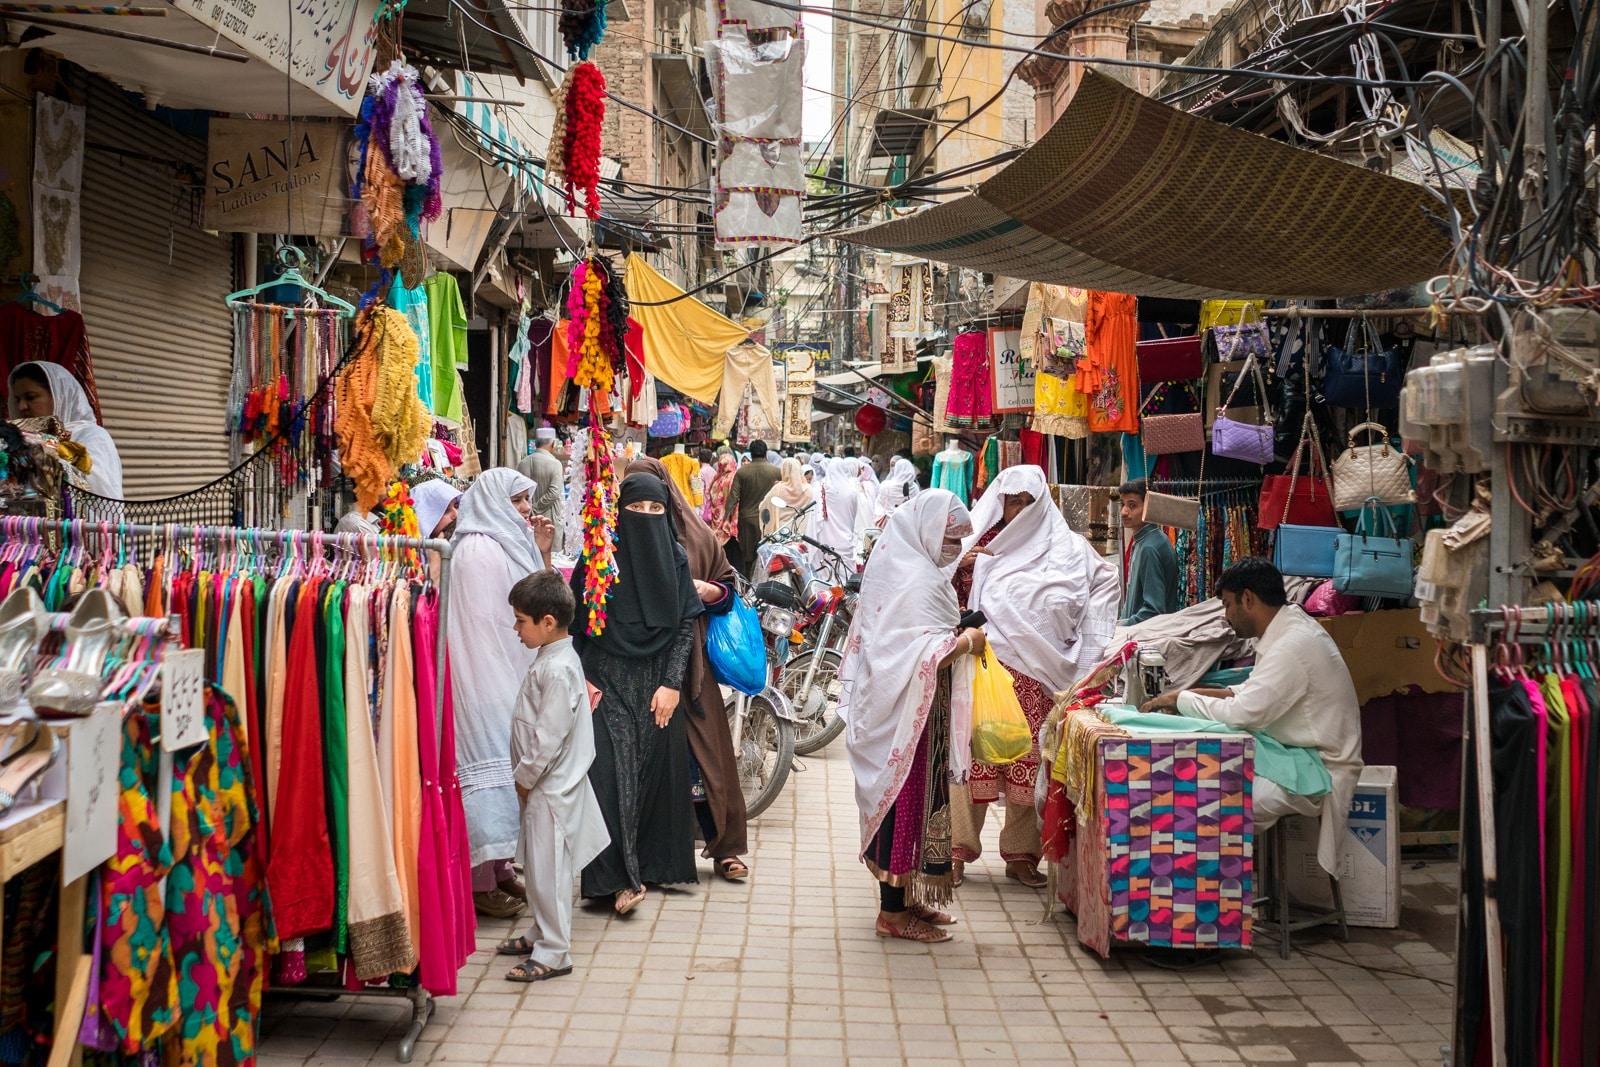 Women shopping in a bazaar in Peshawar, Pakistan